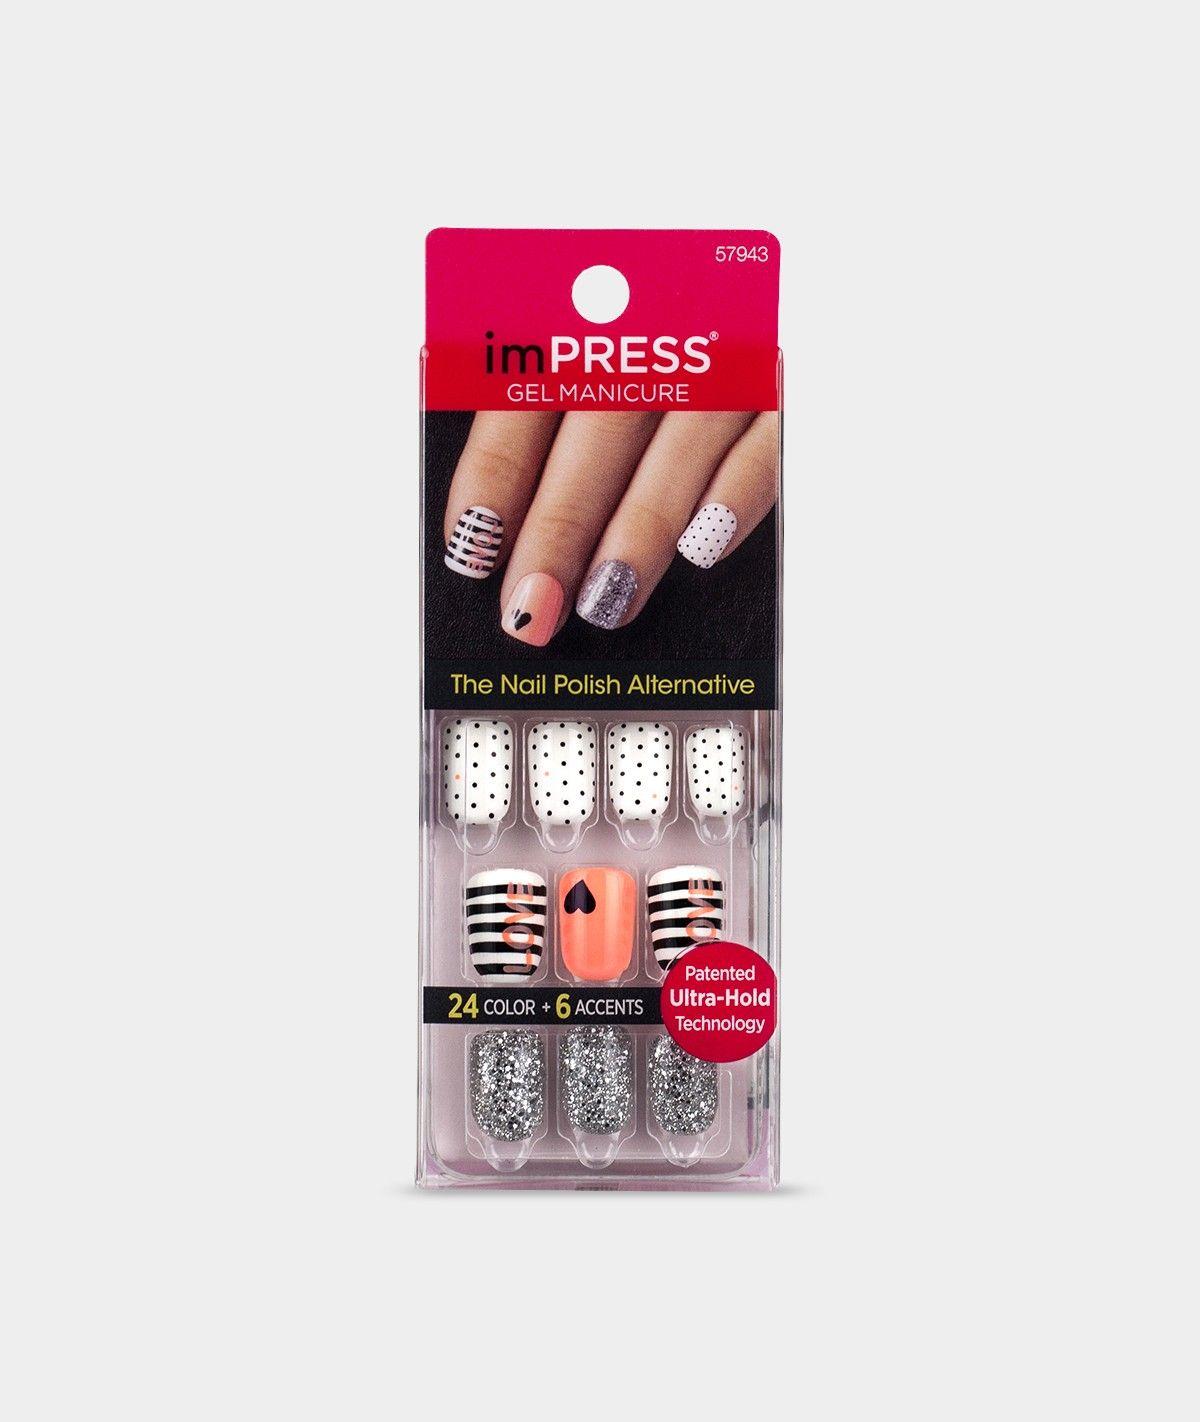 Impress press on manicure nails my style pinterest - Impress Gel Manicure Night Fever Press On Manicure Nails